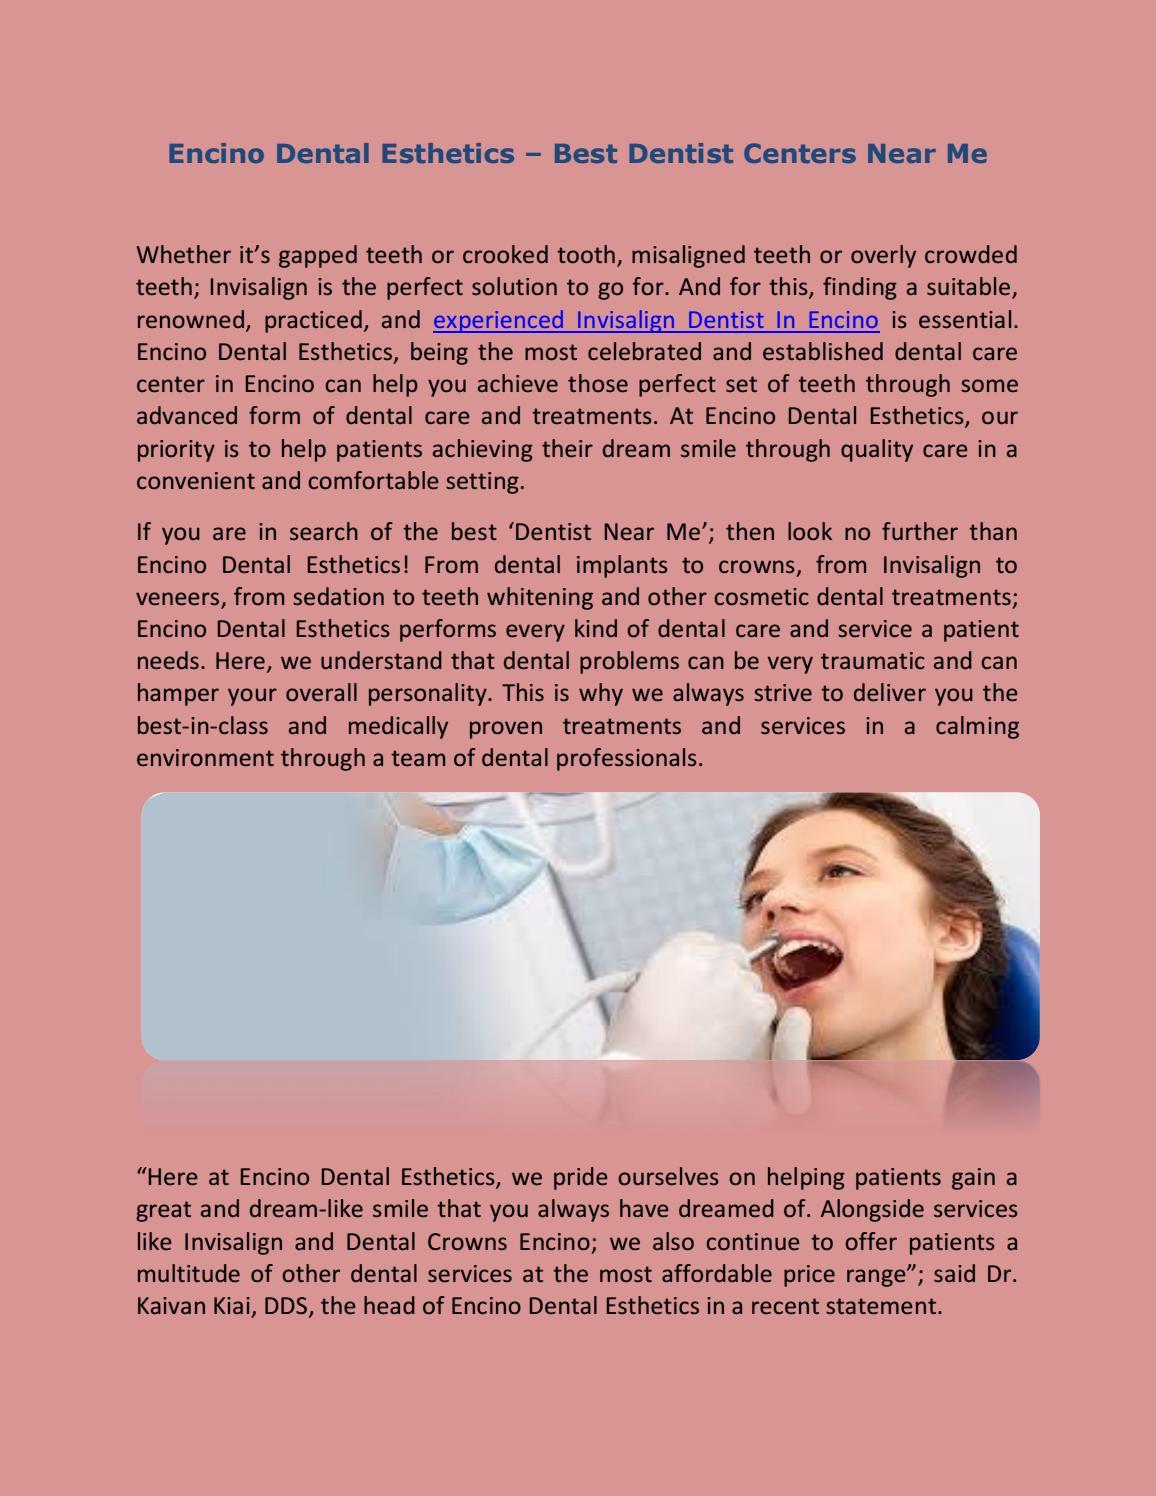 Encino Dental Esthetics – Best Dentist Centers Near Me by